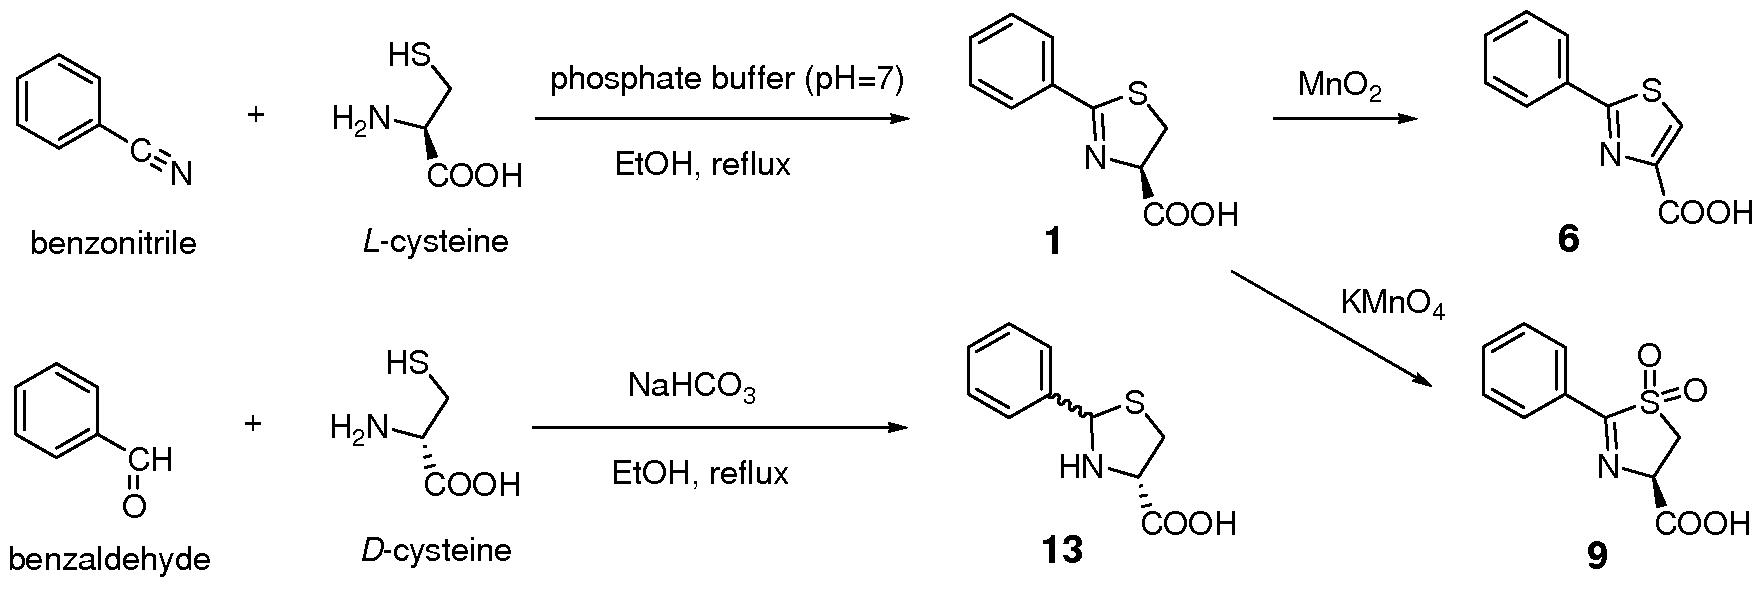 ciprofloxacin alcohol